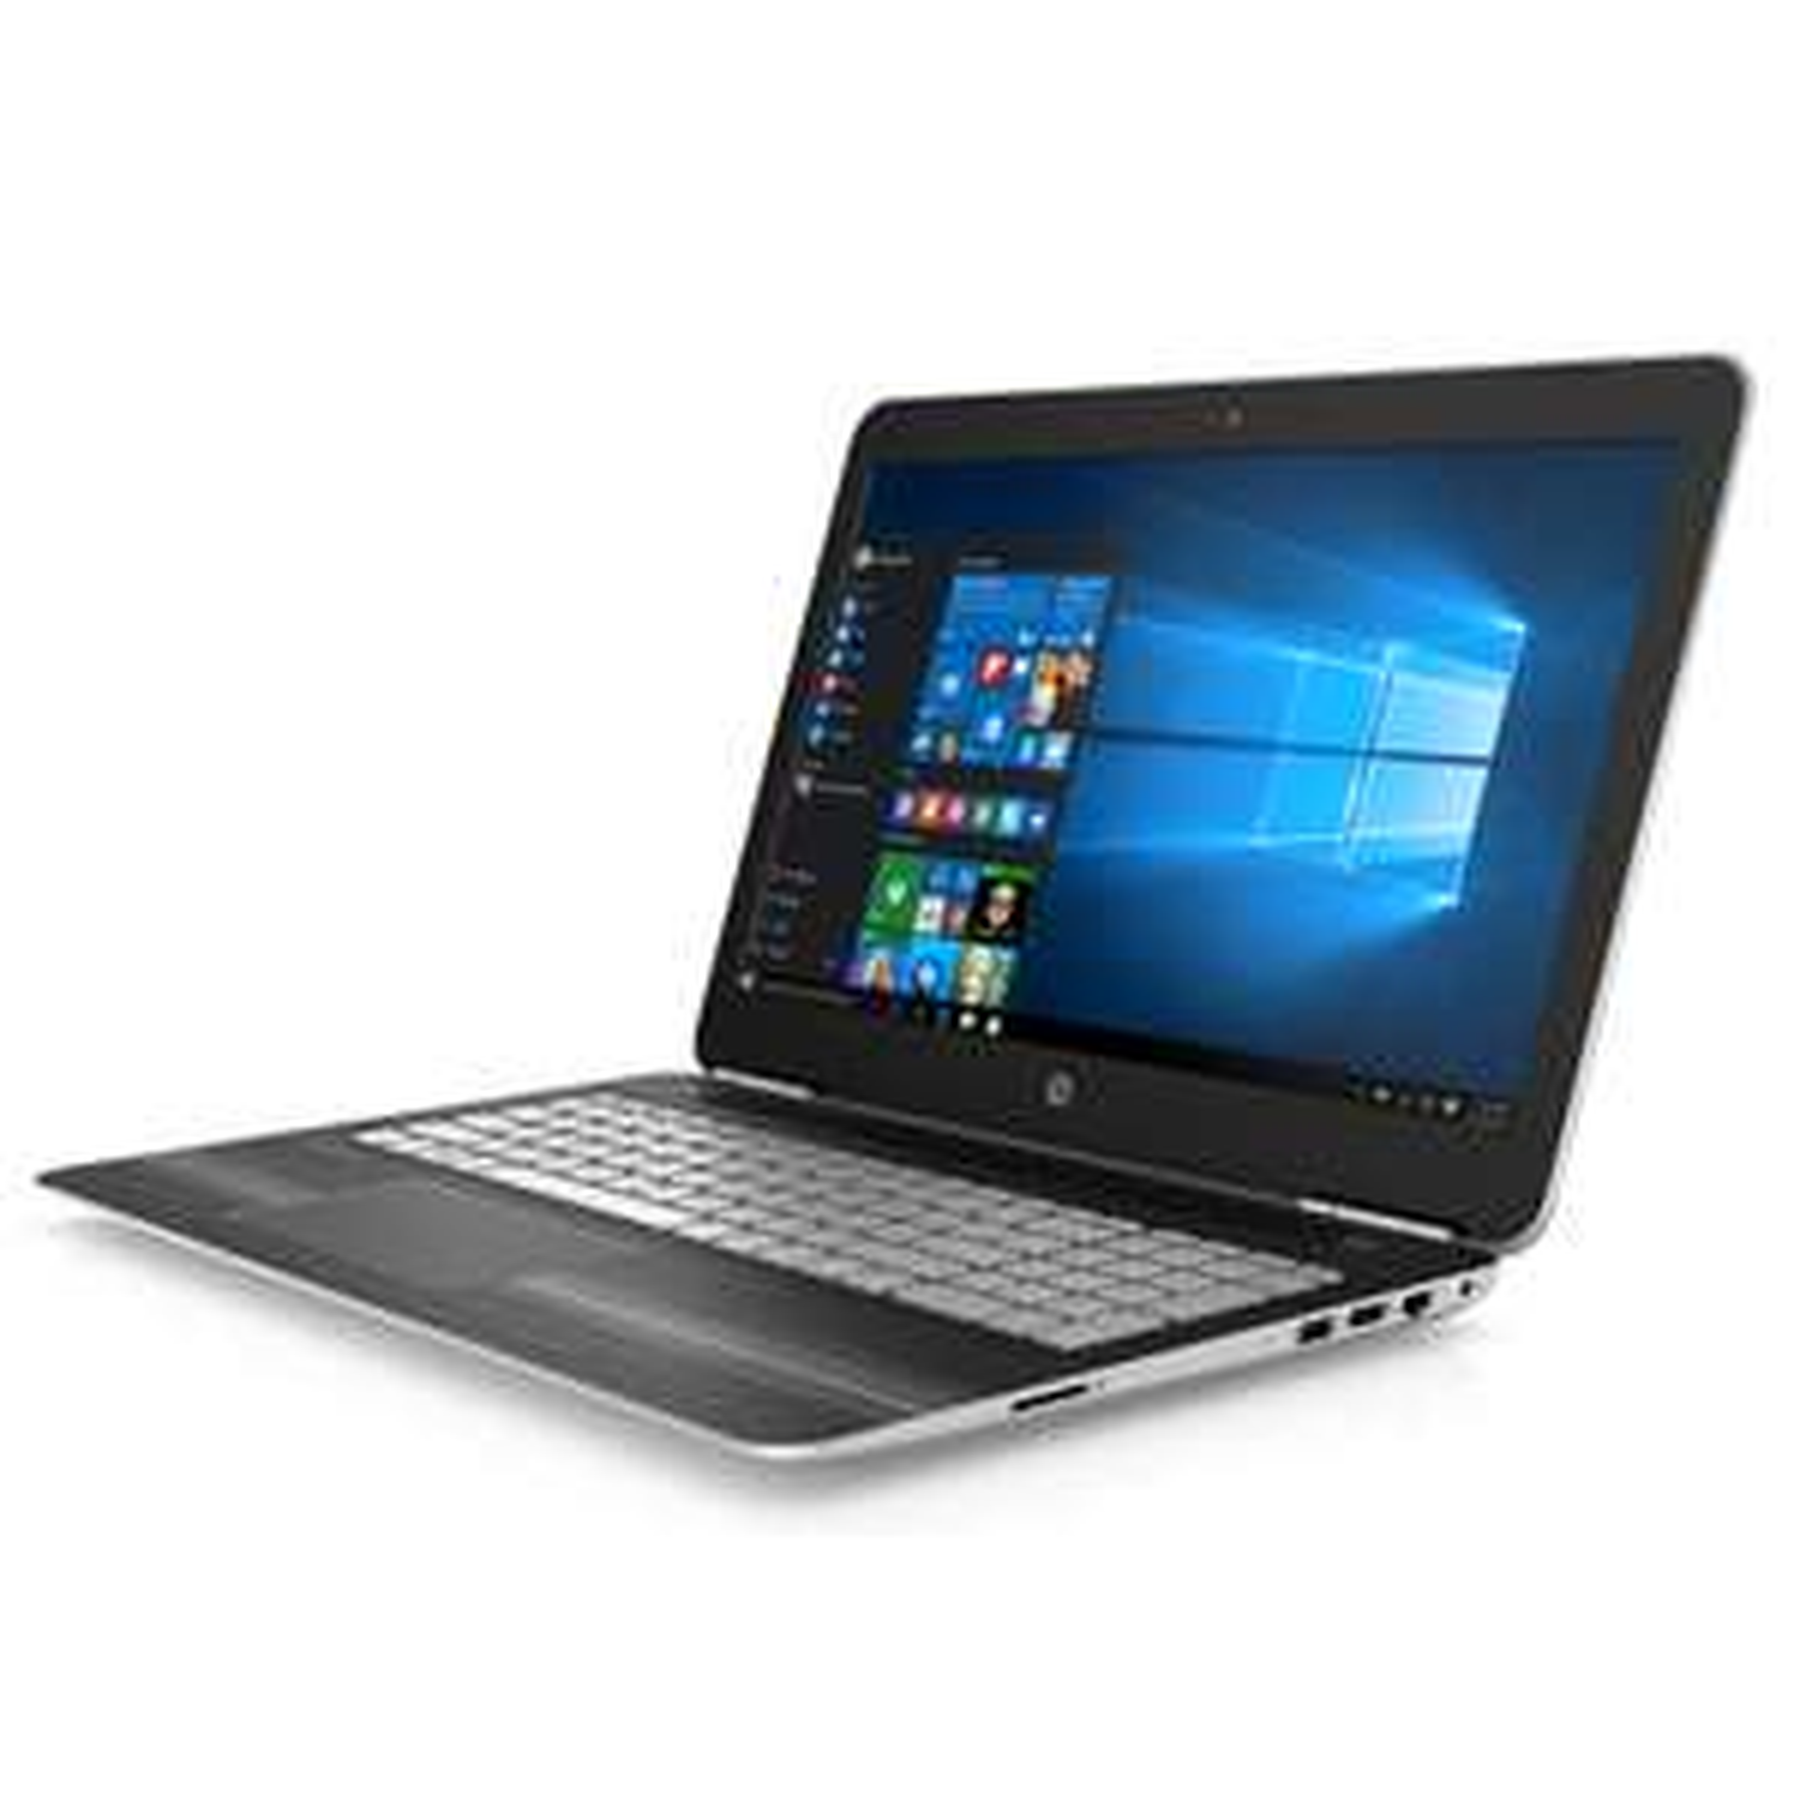 HP, Pavilion 15-bc003ng, full-hd, matt, i5HQ, GTX950M, 128 SSD+1TB HDD